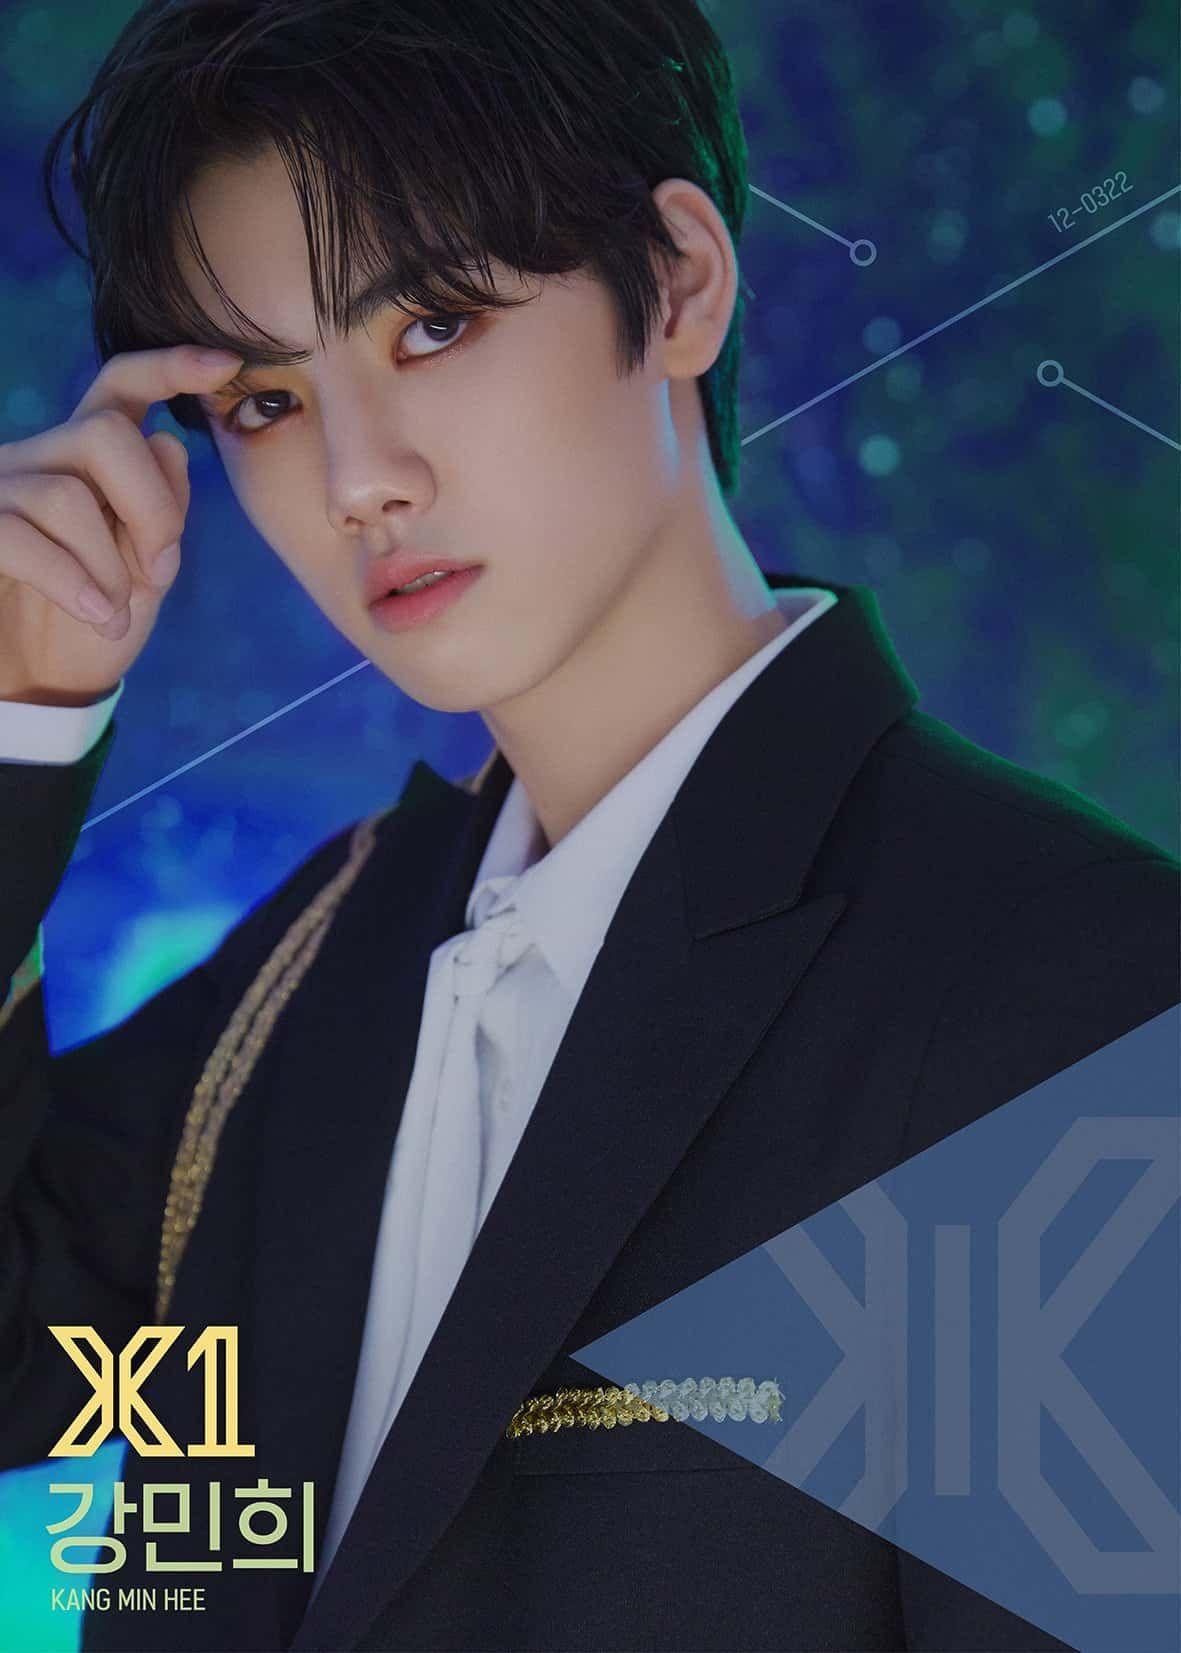 Biodata Profil Fakta Unik Dan Foto Member X1 Kpop Boy Groups Boy Bands